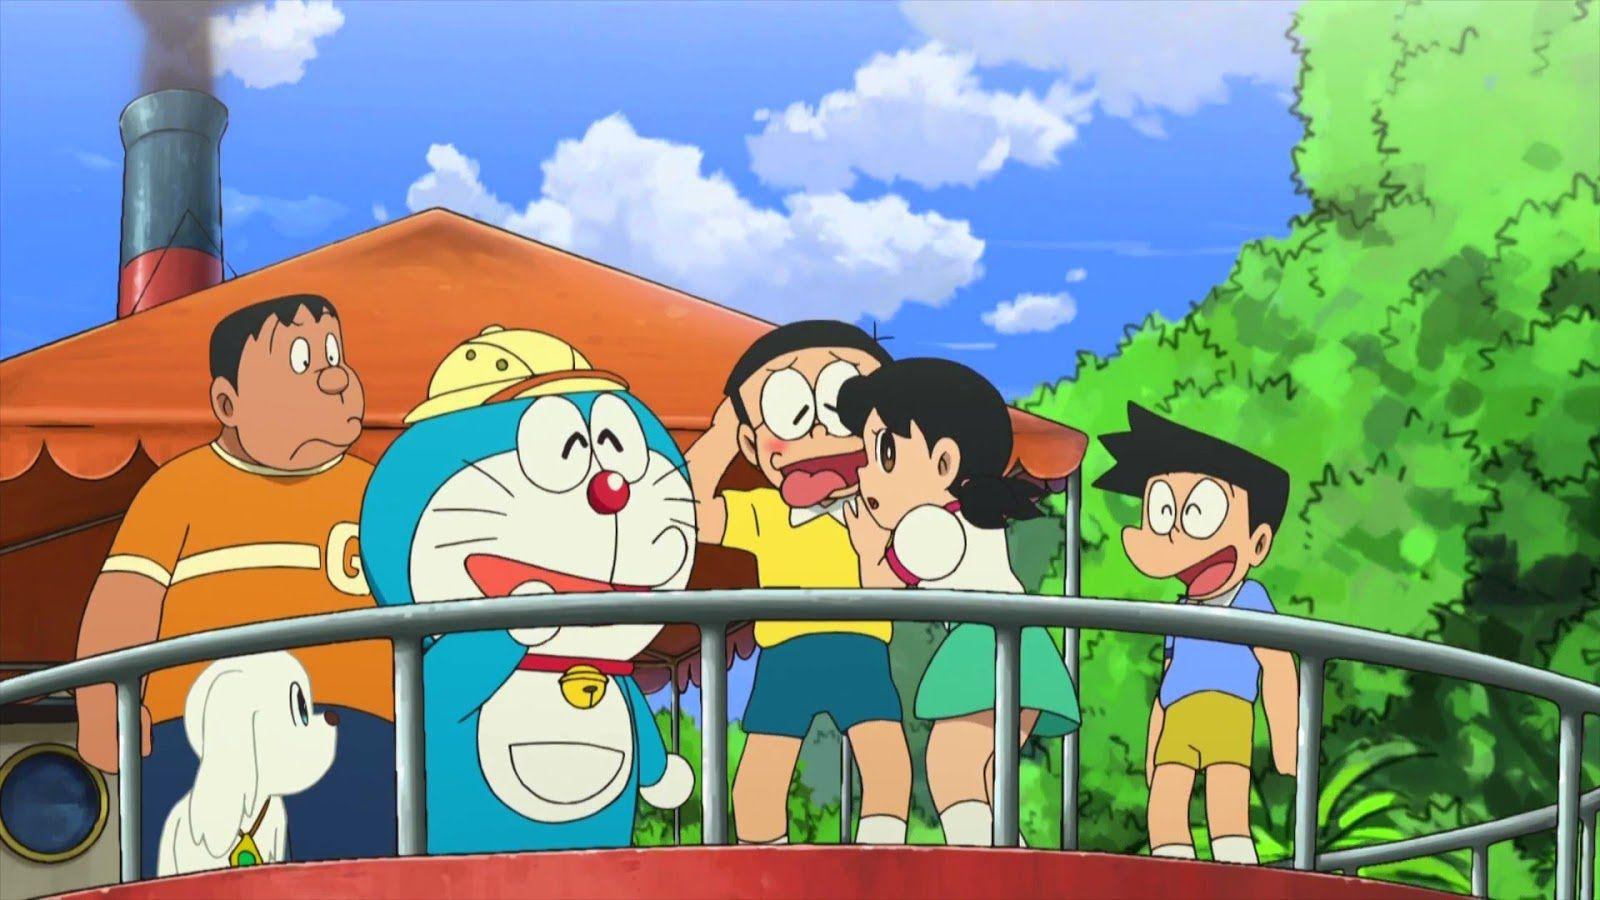 Doraemon In Hindi All New Episodes Full 2016 Disney